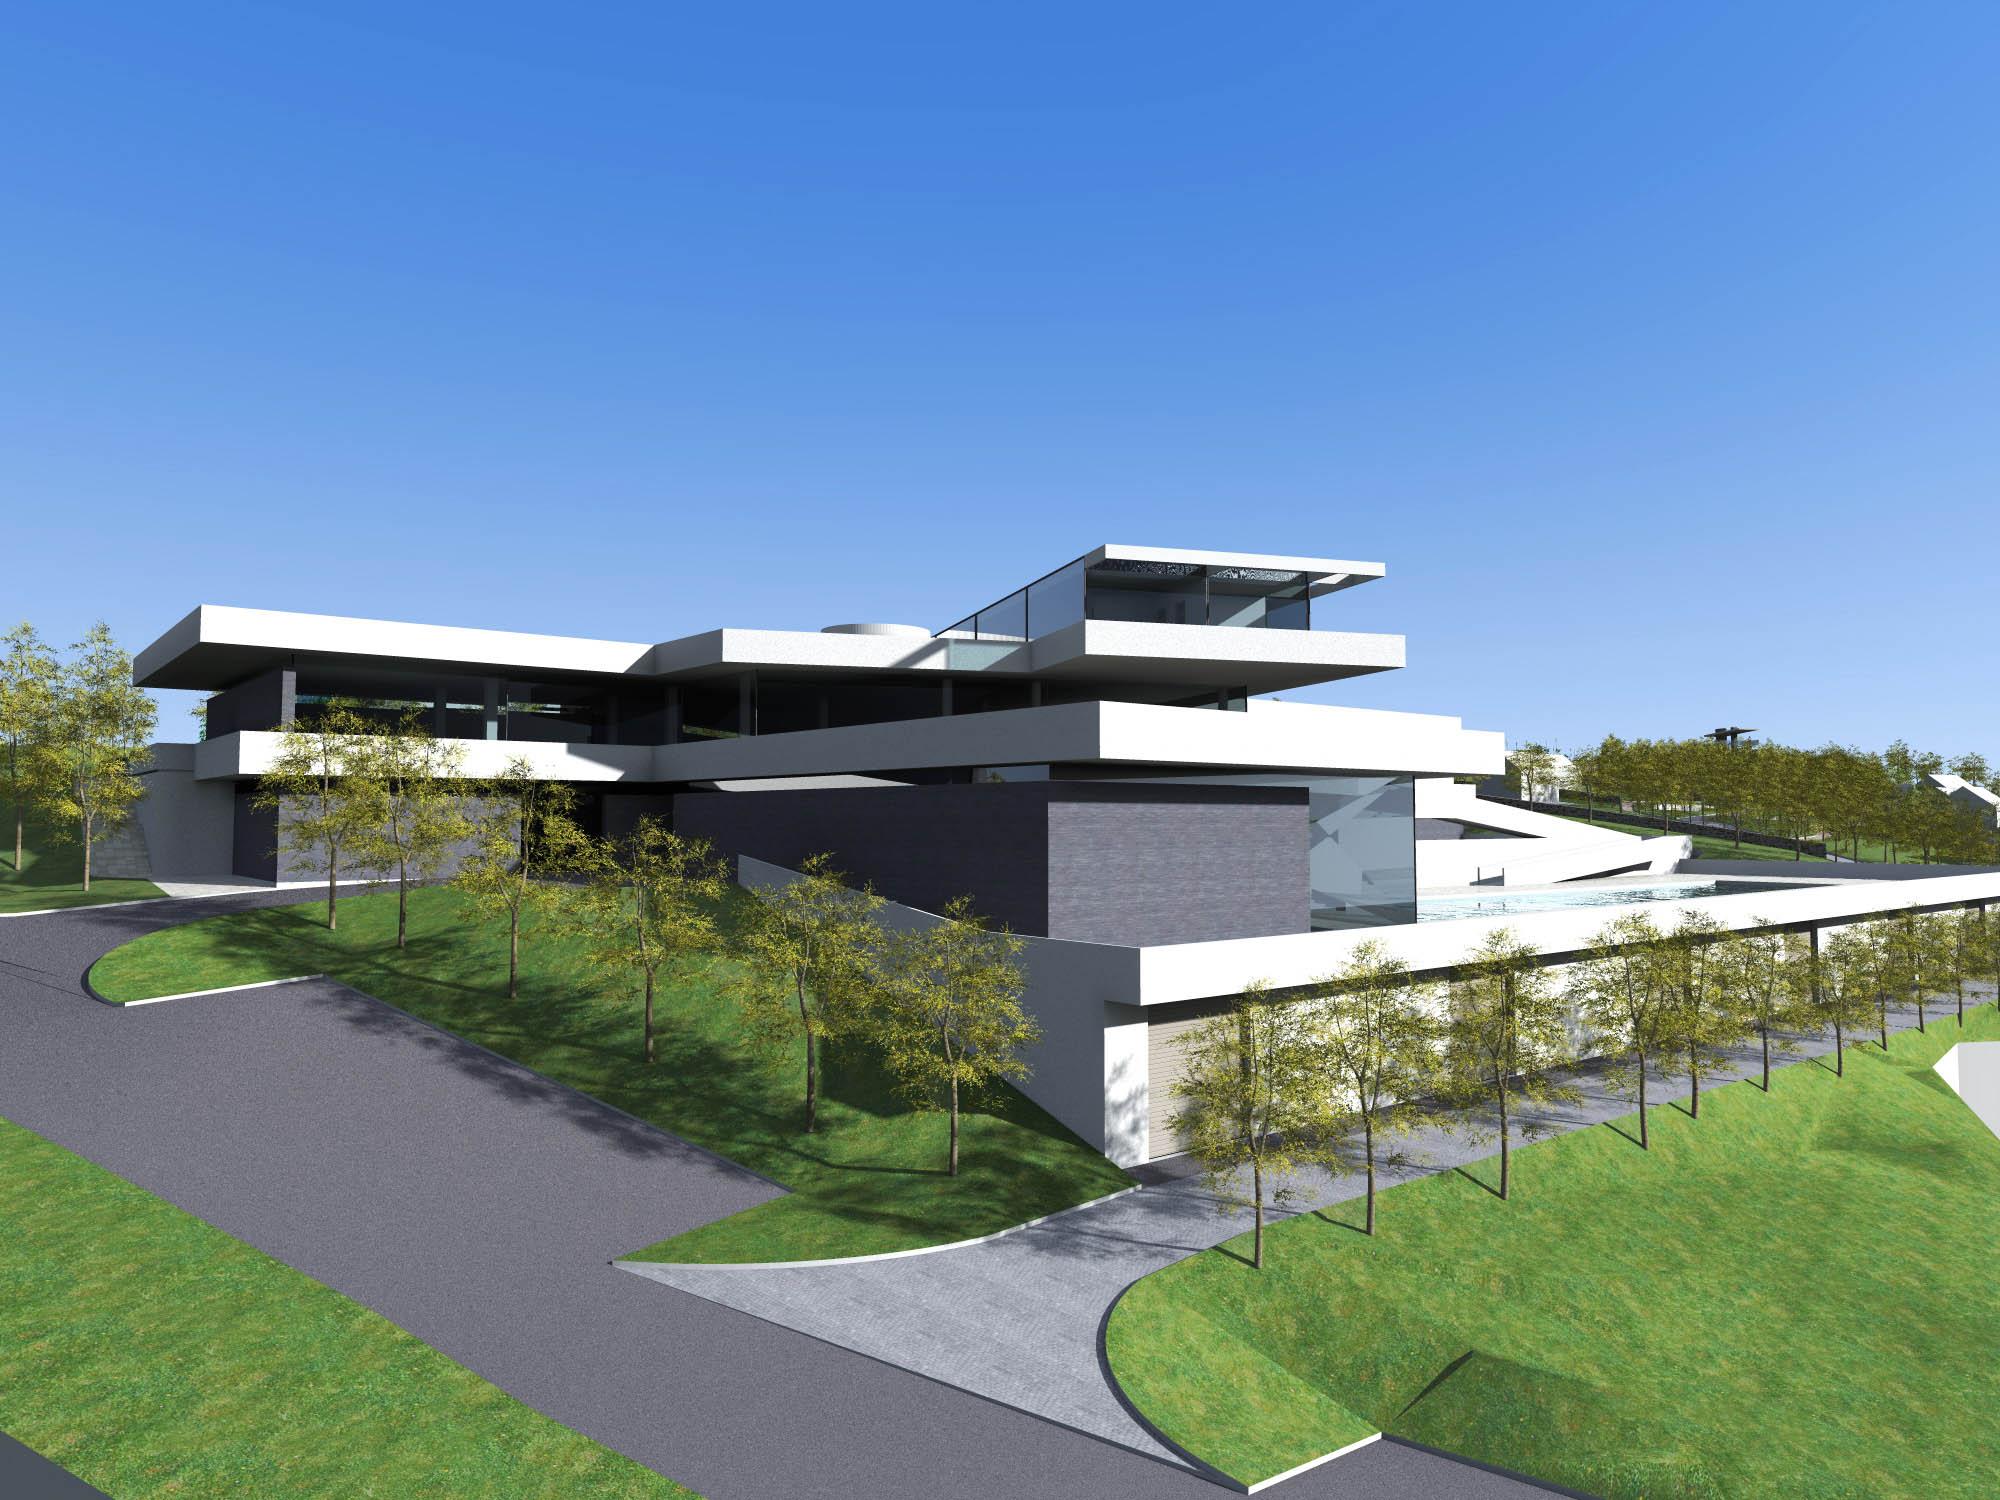 Concept design of the auto camp complex motel ethno for Motel exterior design